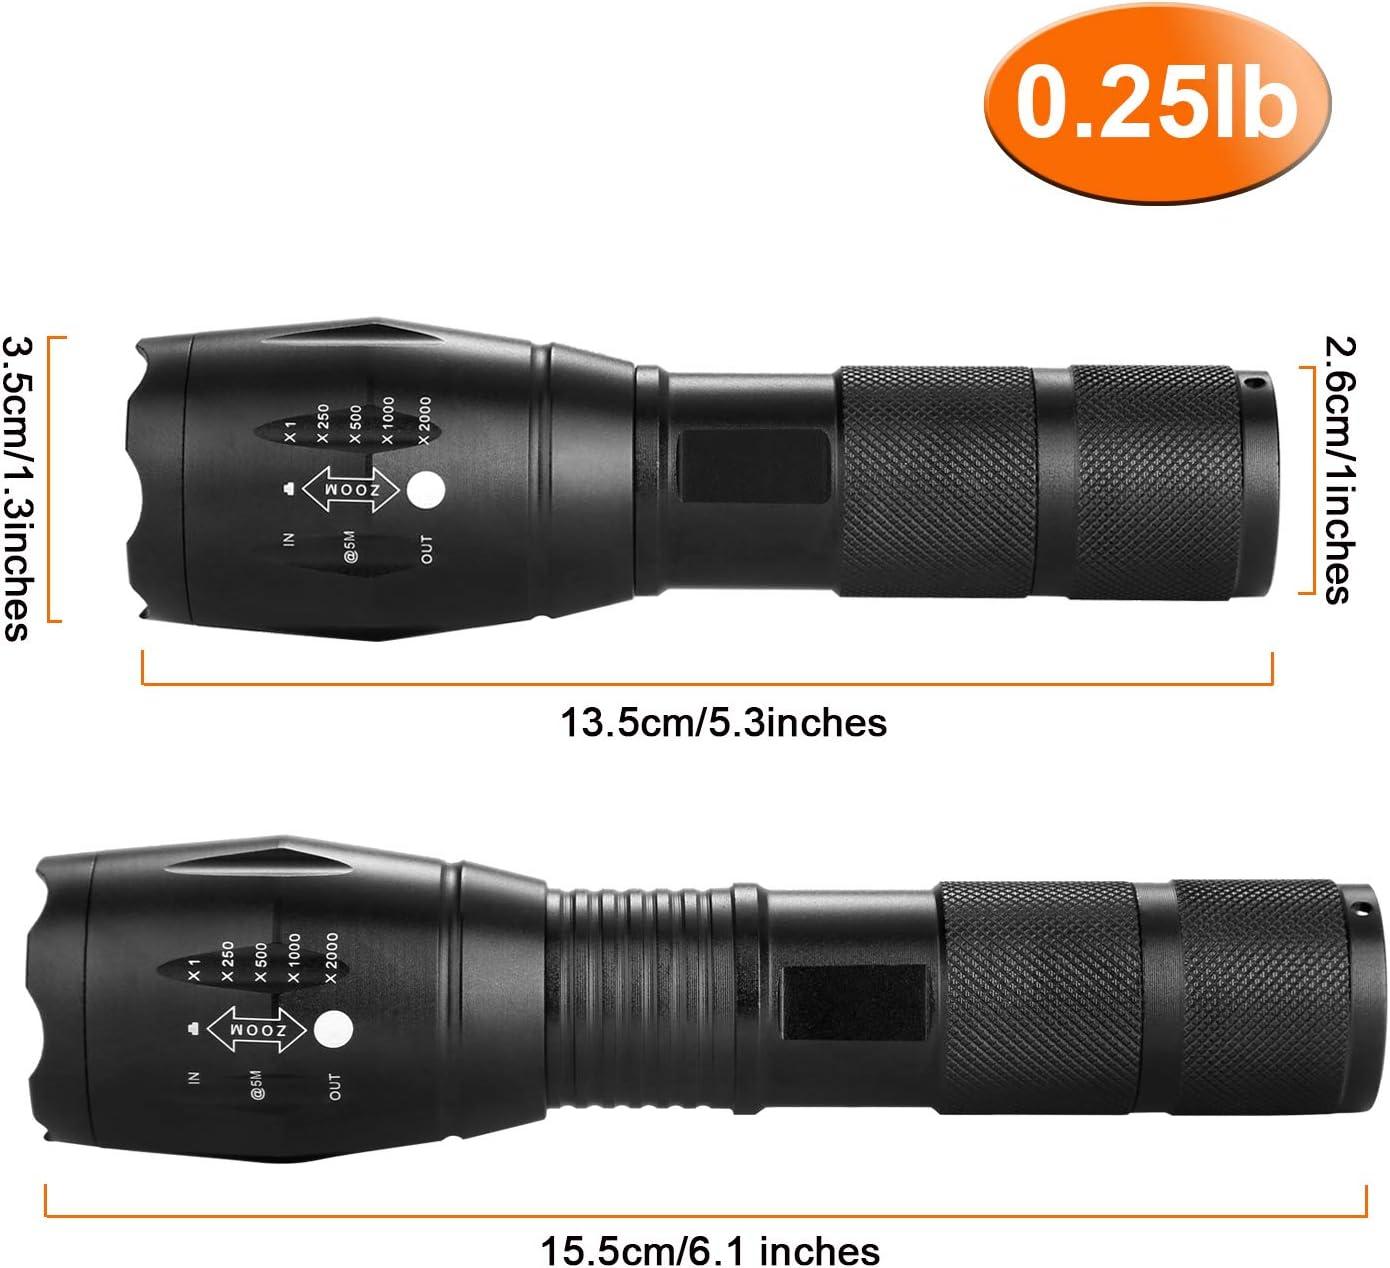 Powerful Lightweight Flashlight Waterproof Torches Set Adjustable Headlamp for Outdoor Running Camping Fishing Odoland LED Head Torch Set 2 Headlamp with 2 * 1000 Lumens Flashlight